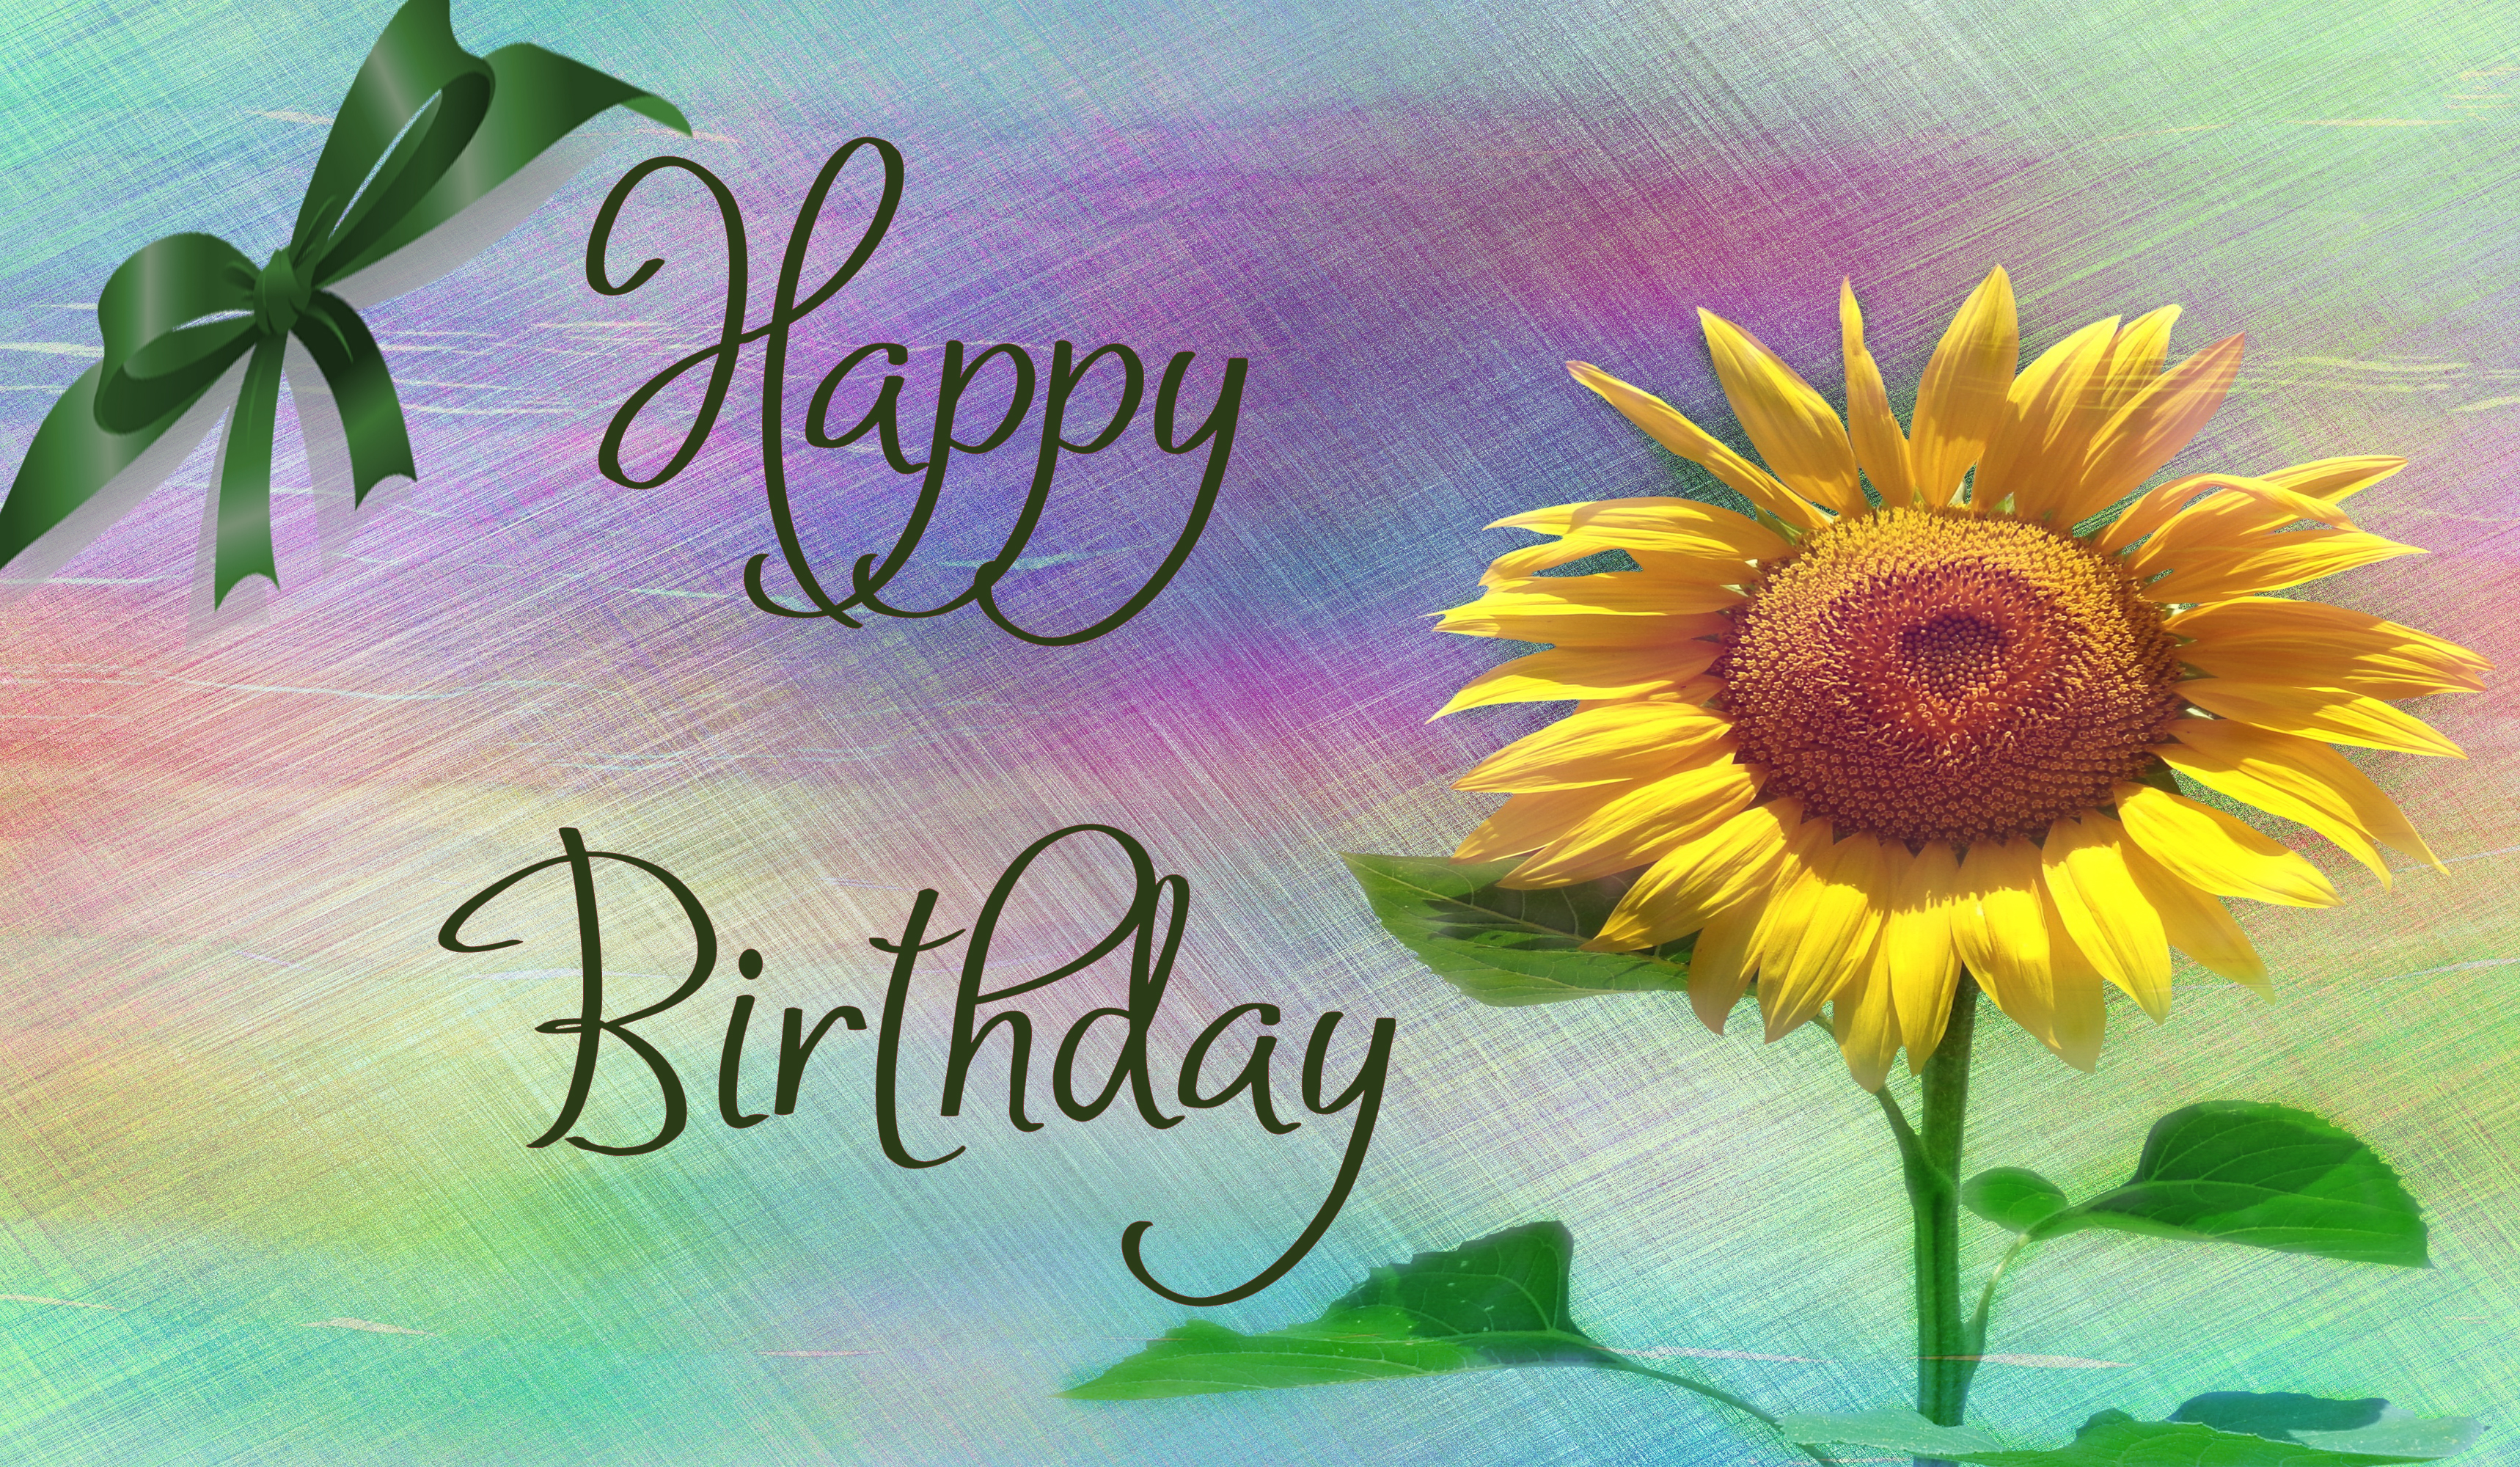 File:Happy Birthday with Sunflower.jpg - Wikimedia Commons |Creative Commons Birthday